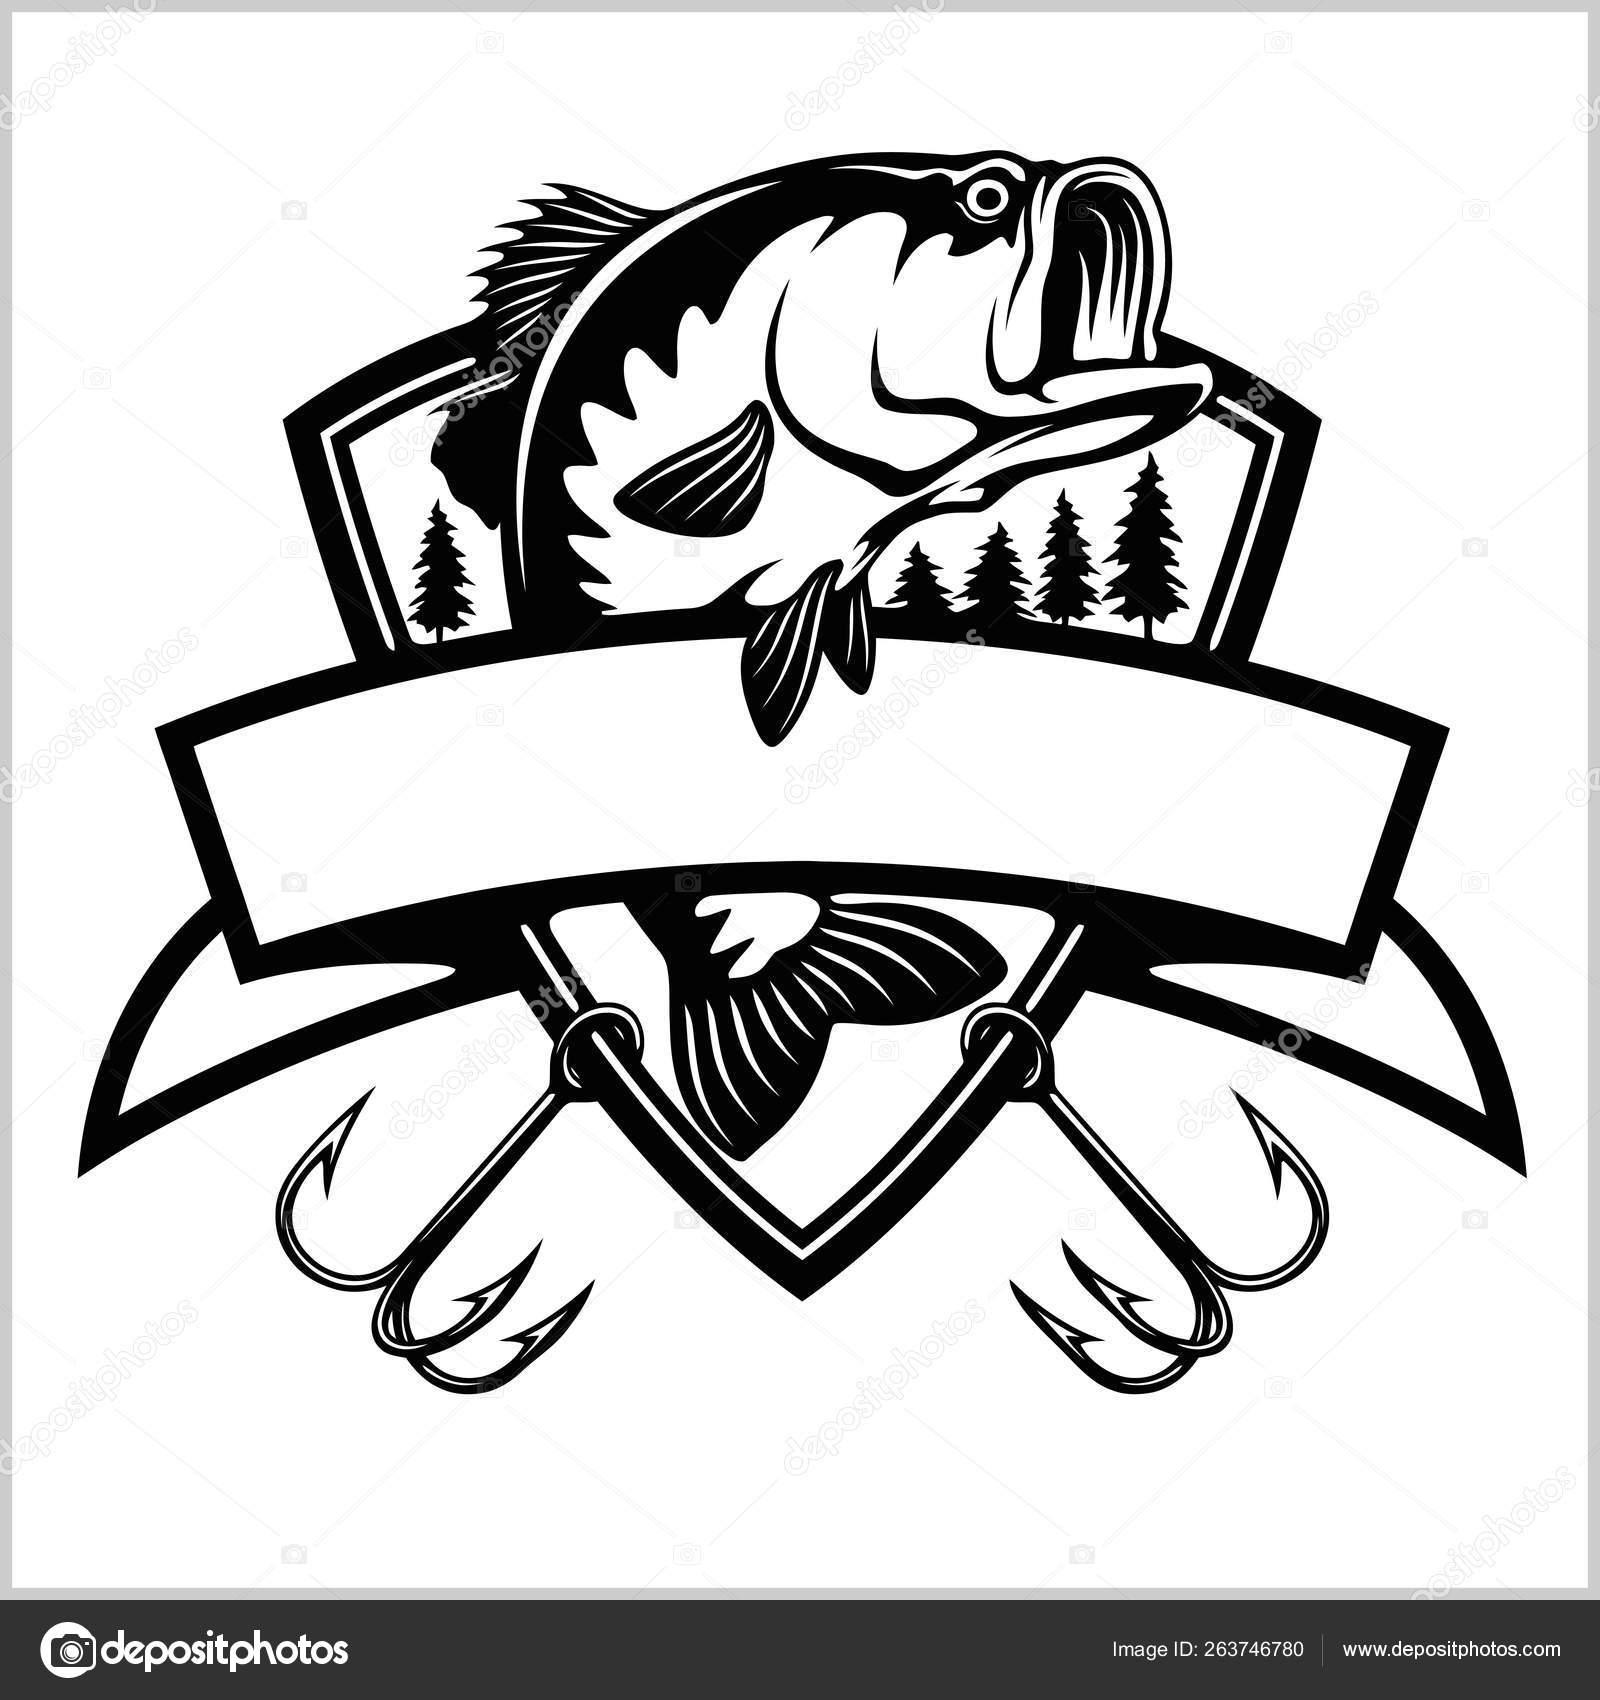 Clipart: bass fish.